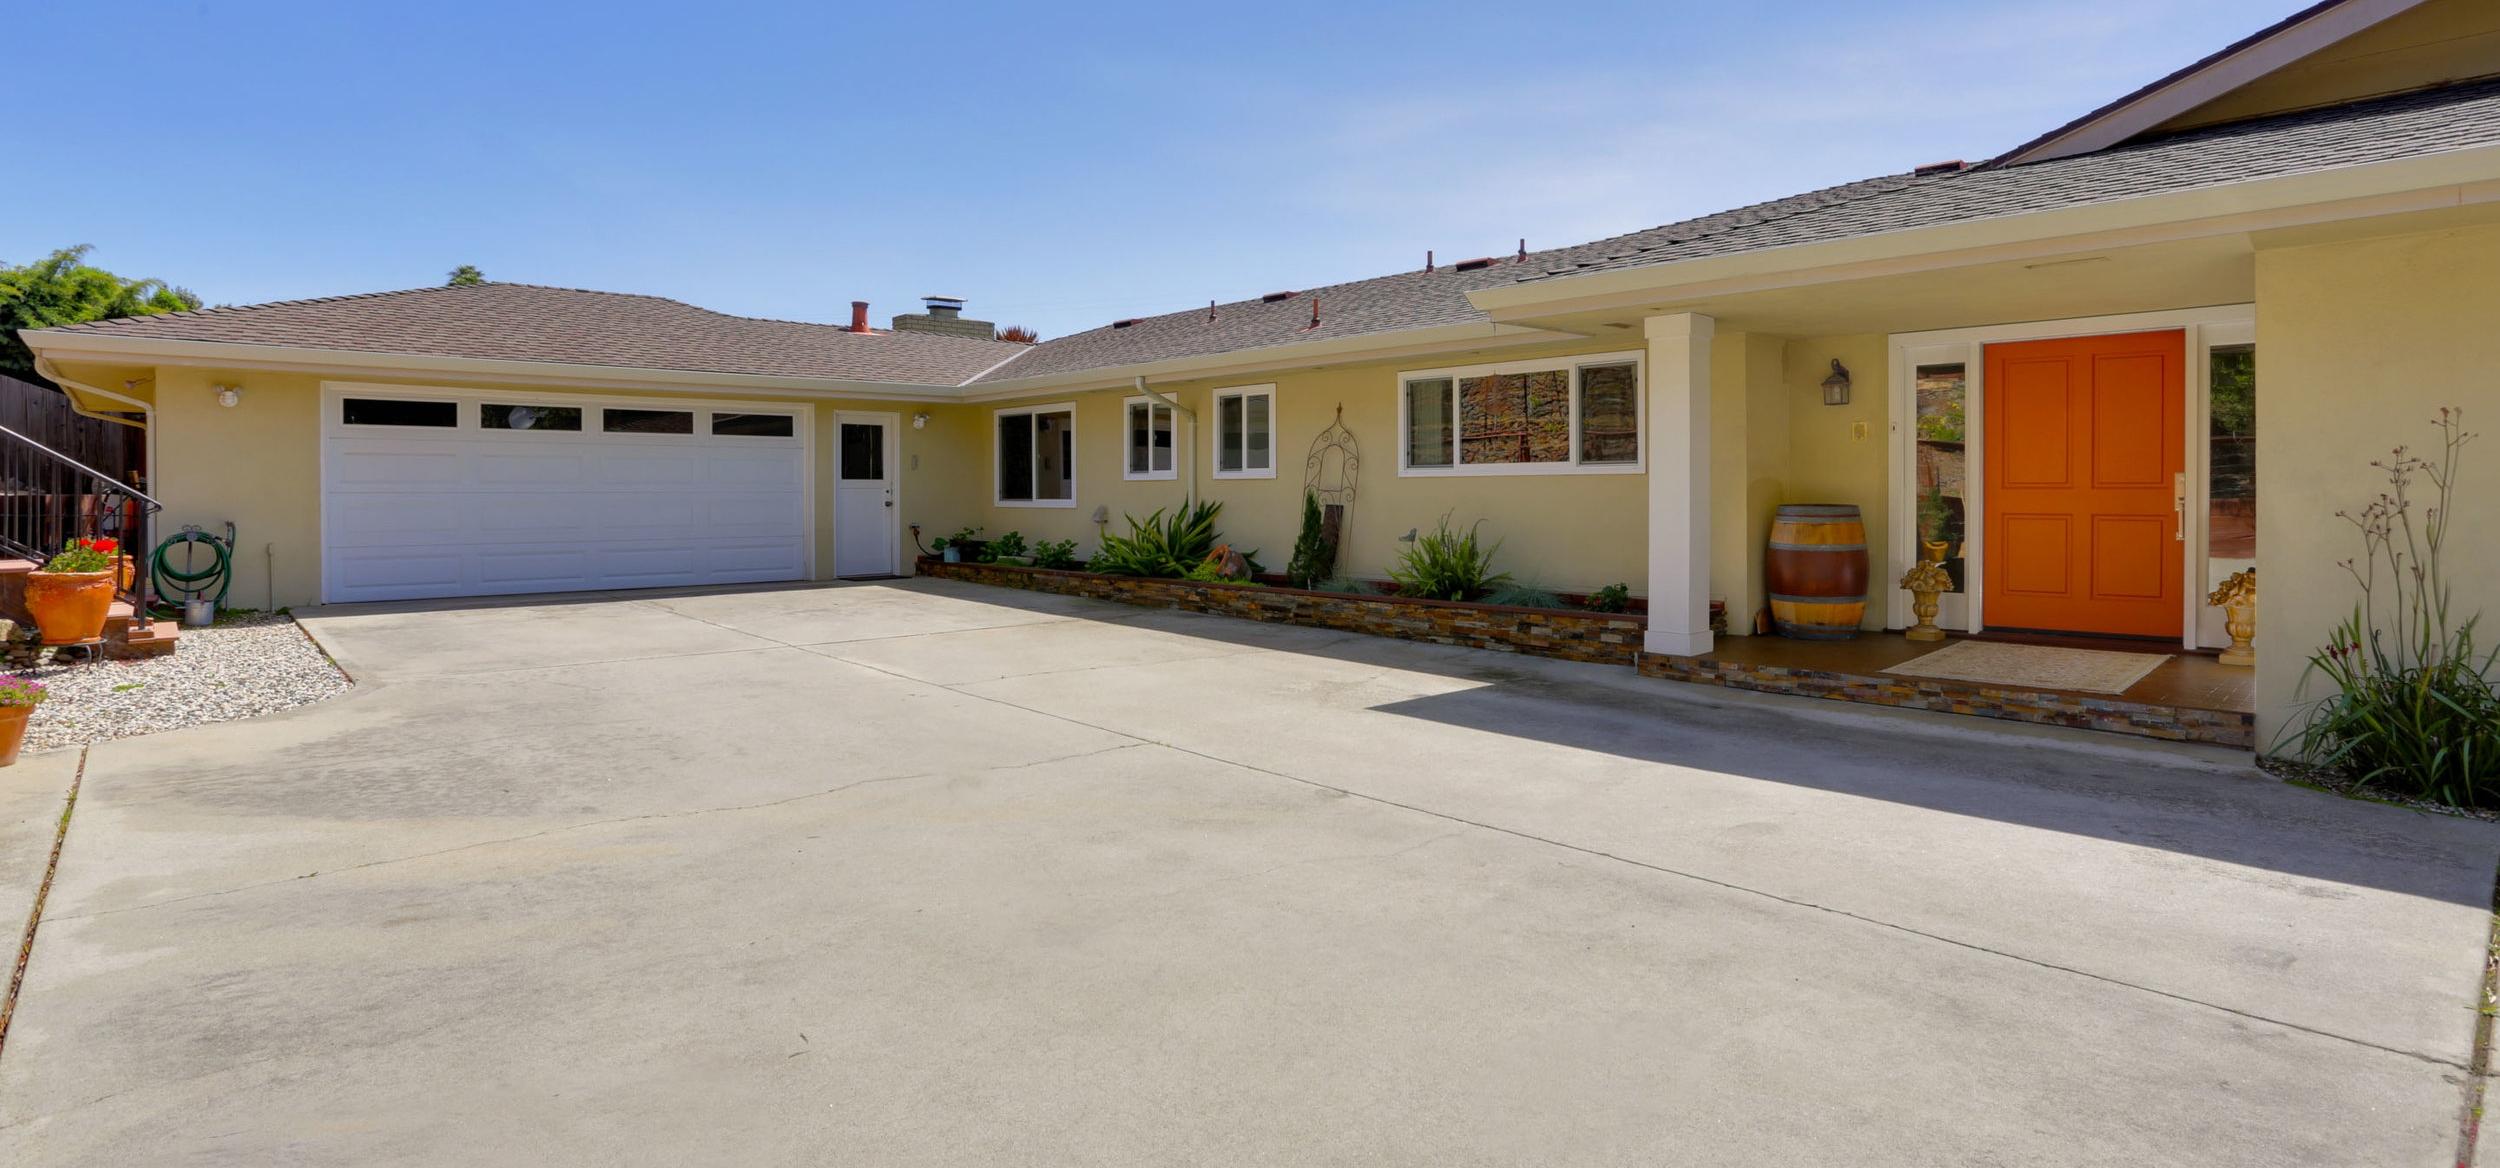 3293 W Ledyard Way, Aptos, CA WEB-25.JPG